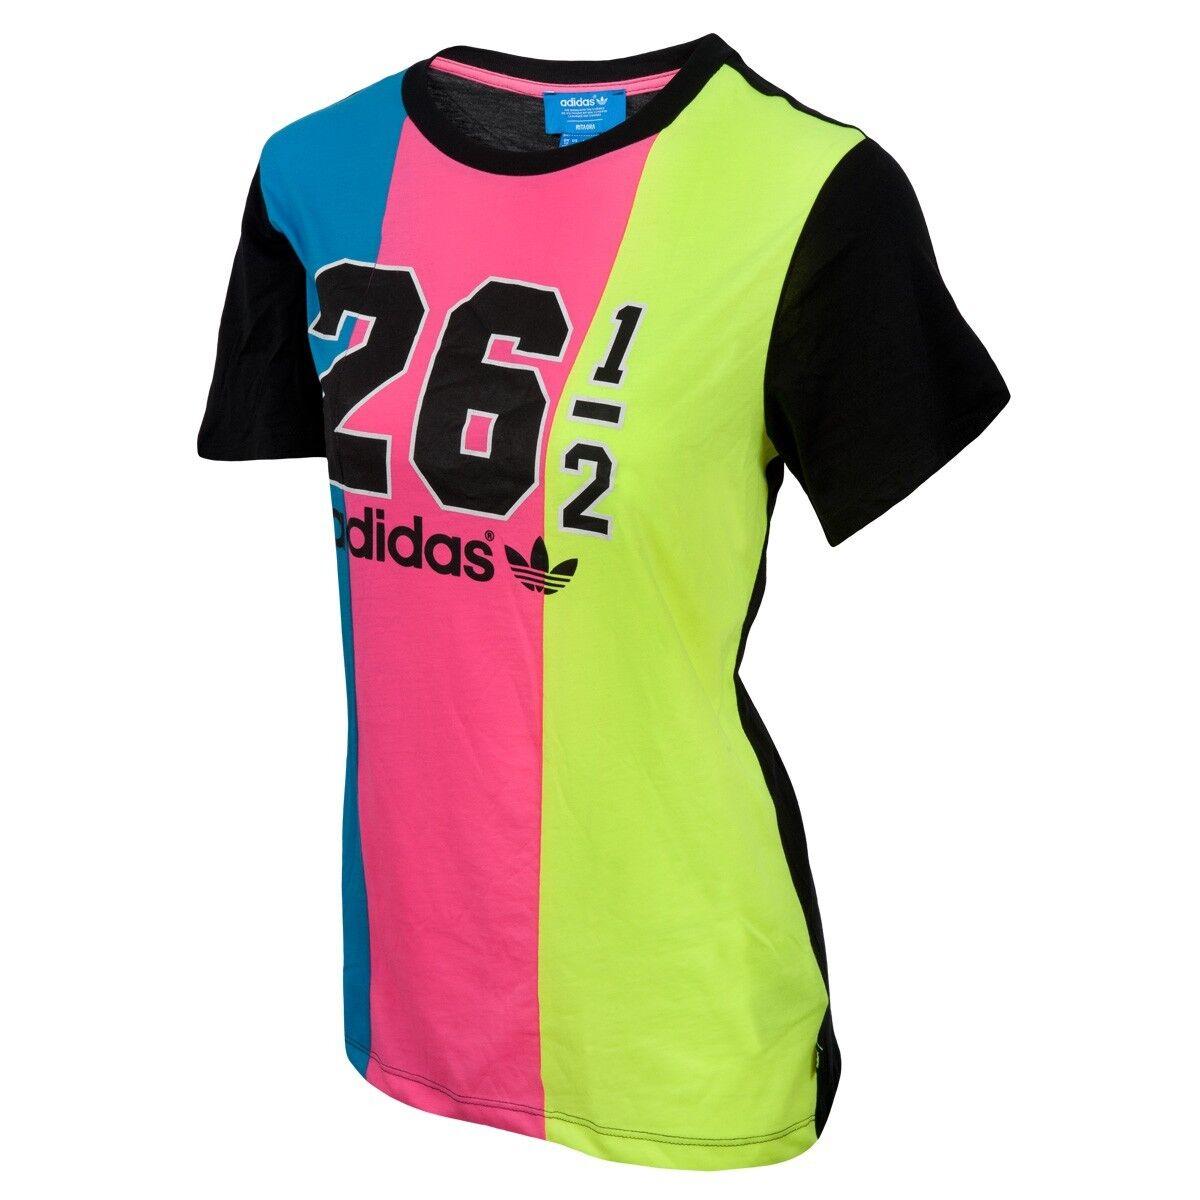 Adidas Originals Rita Ora Fashion Boyfriend T Shirt   Leggings All ... 0bf3c29194f